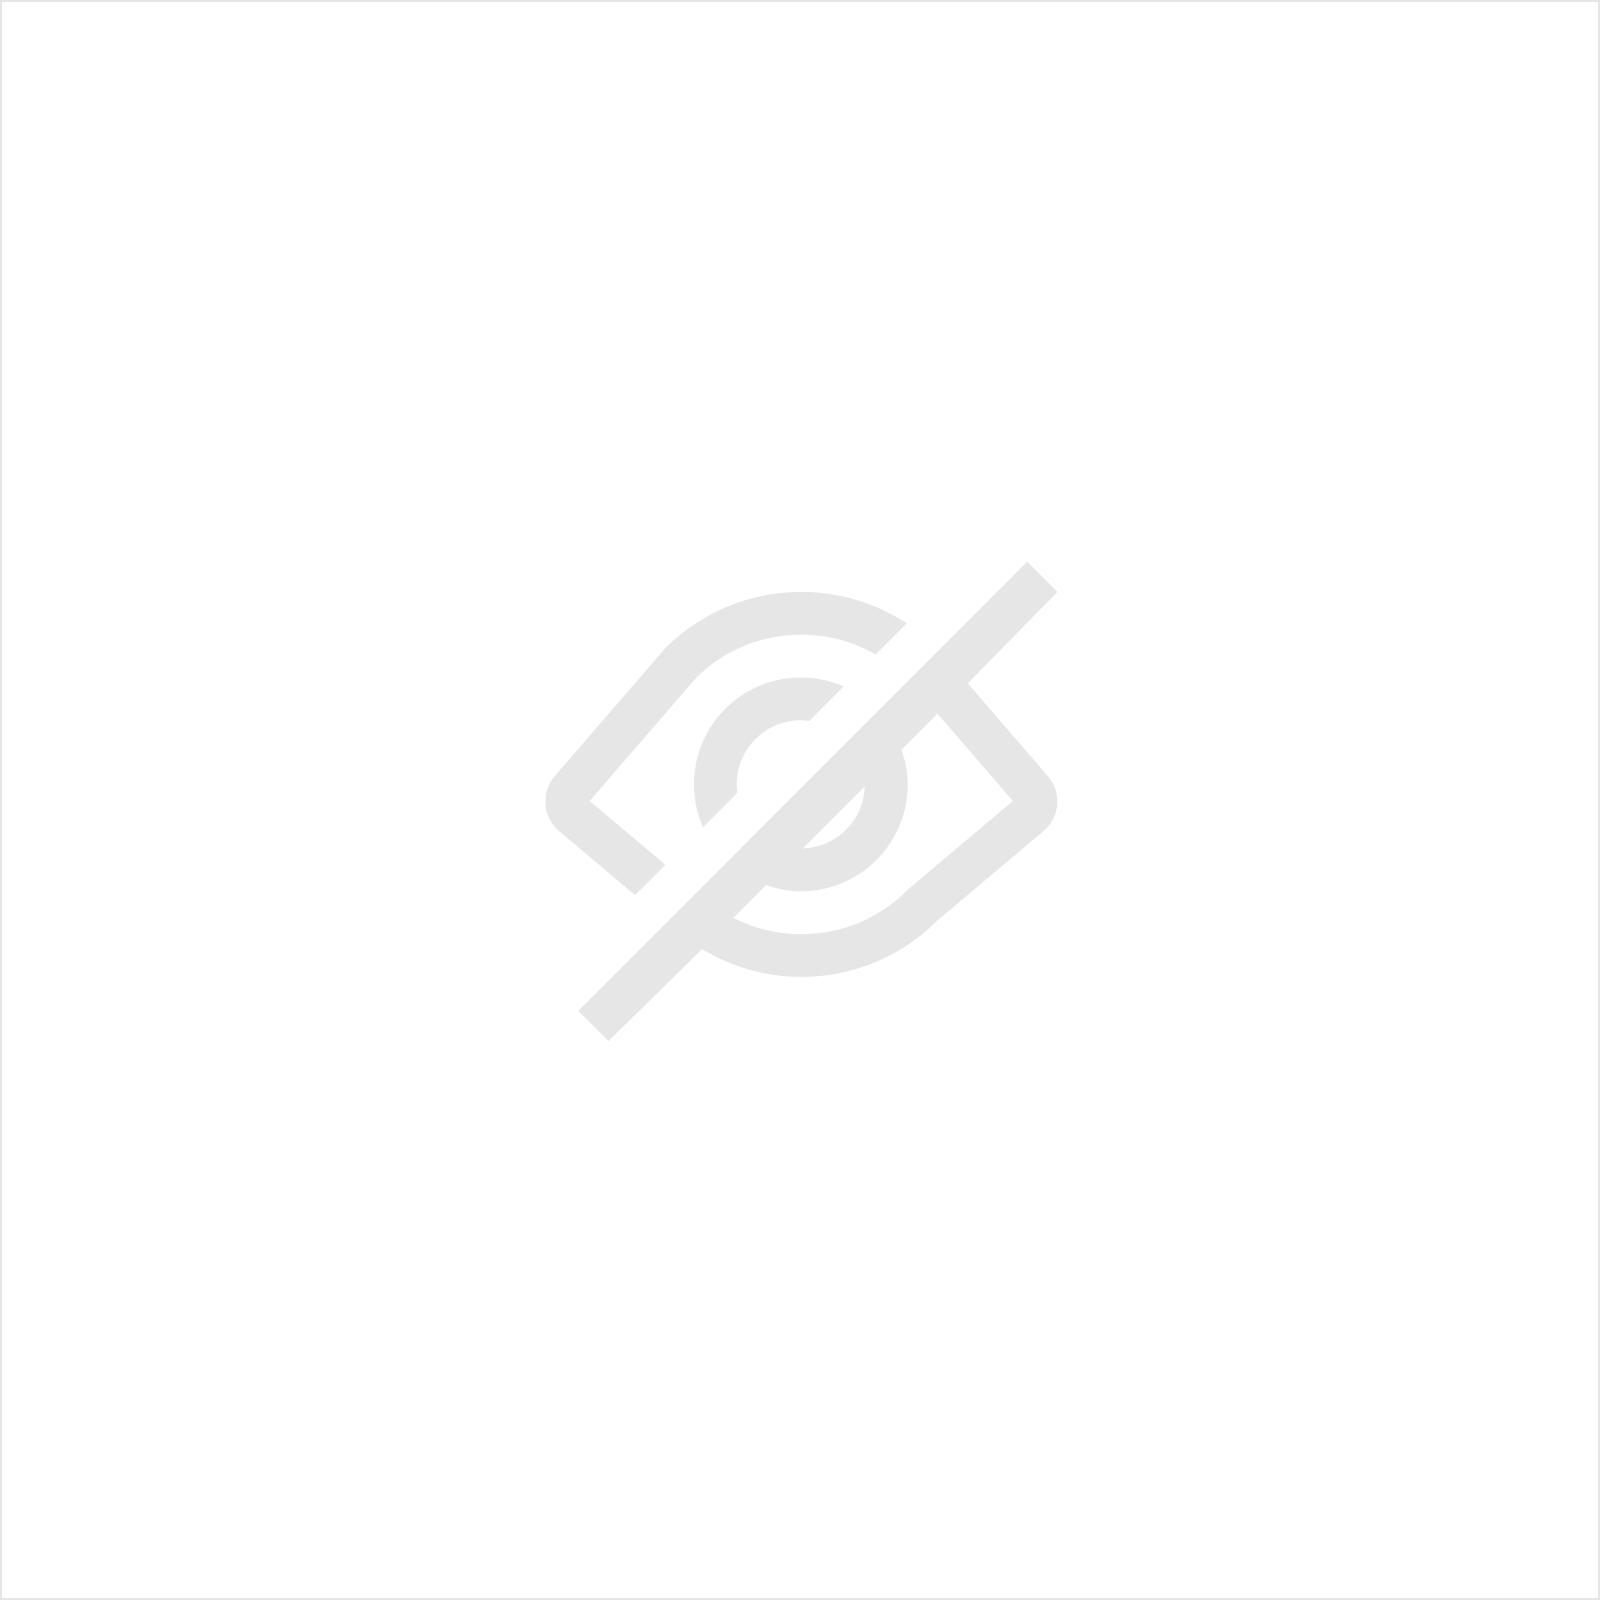 OPTIONEEL STANDARD ART PATTERN ROLL VOOR BOORD EN LIJSTMACHINE